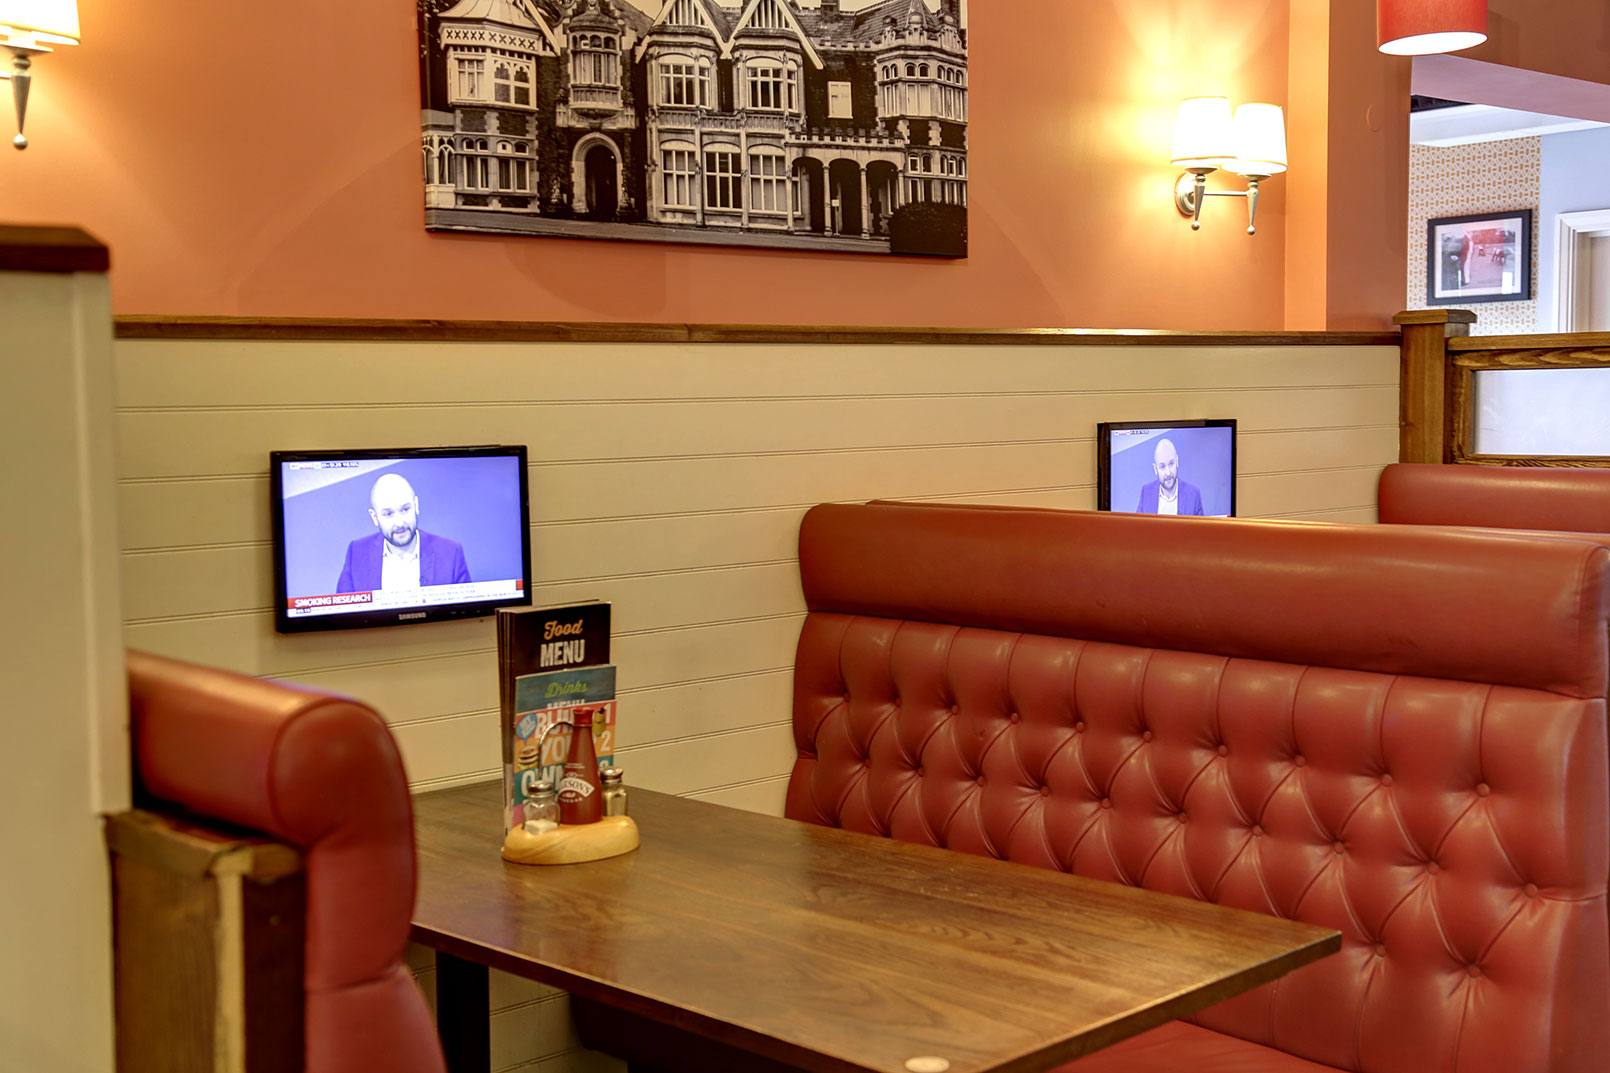 Elegant ... Milton Keynes Hotel Dining 09 83989 ... Part 20